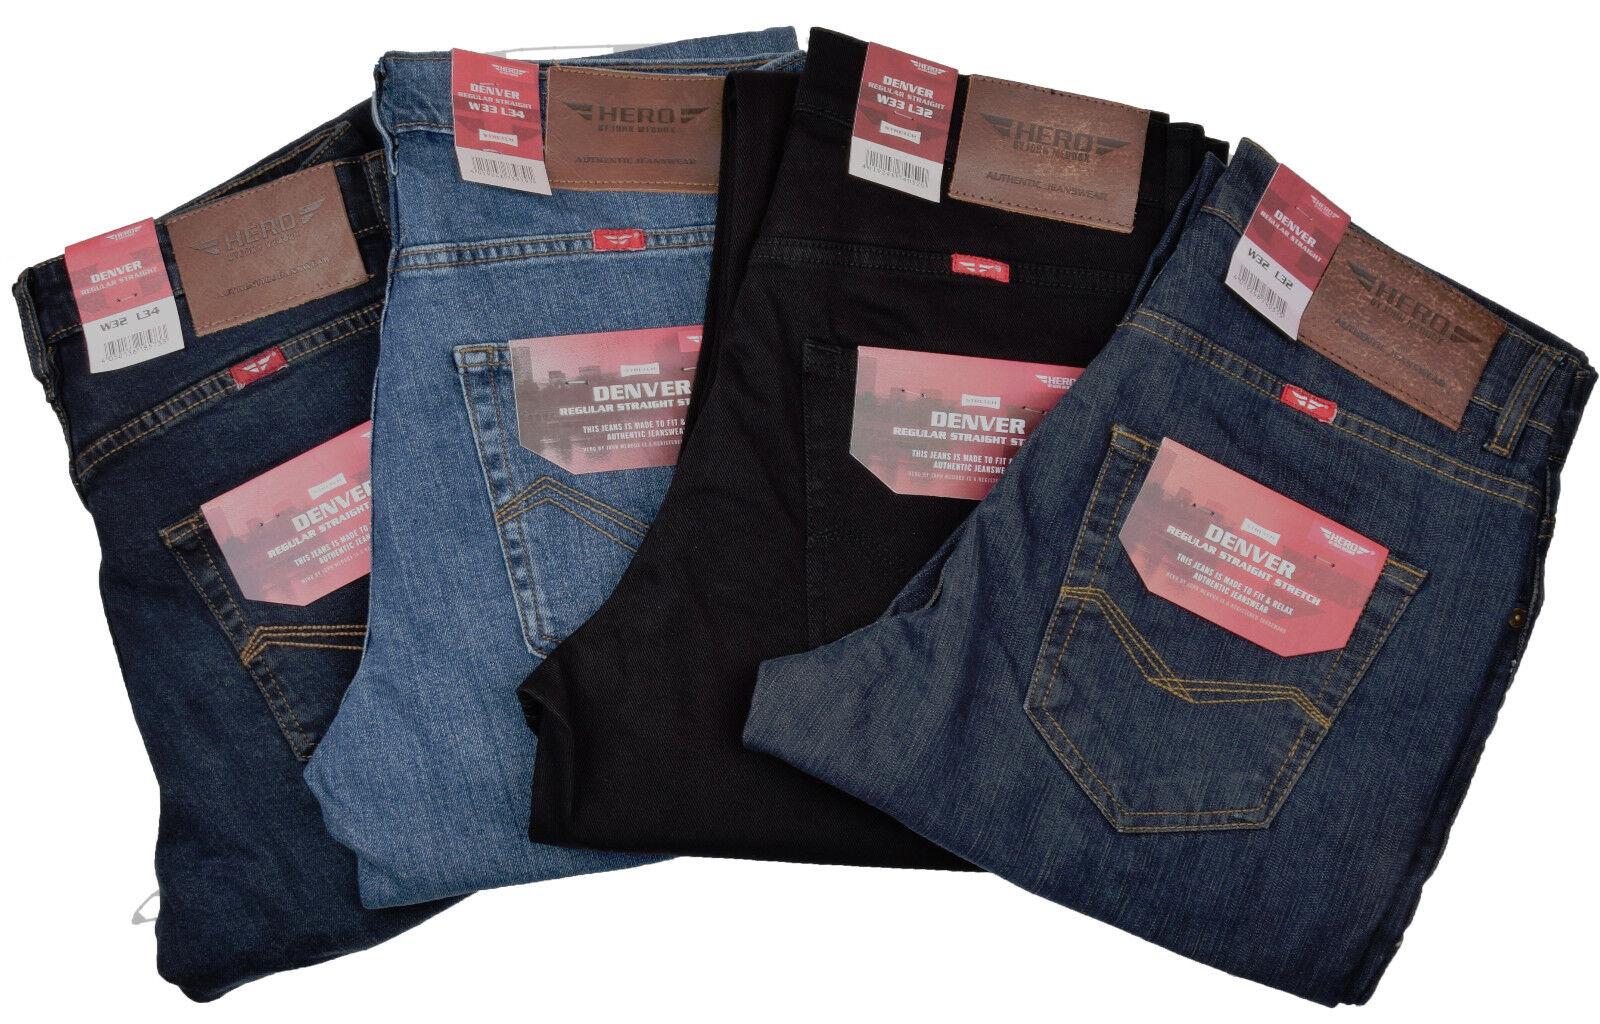 Hero Denver Stretch Jeans Hommes Stonewash Pantalons Pantalon STOOKER 4 Couleurs Neuf